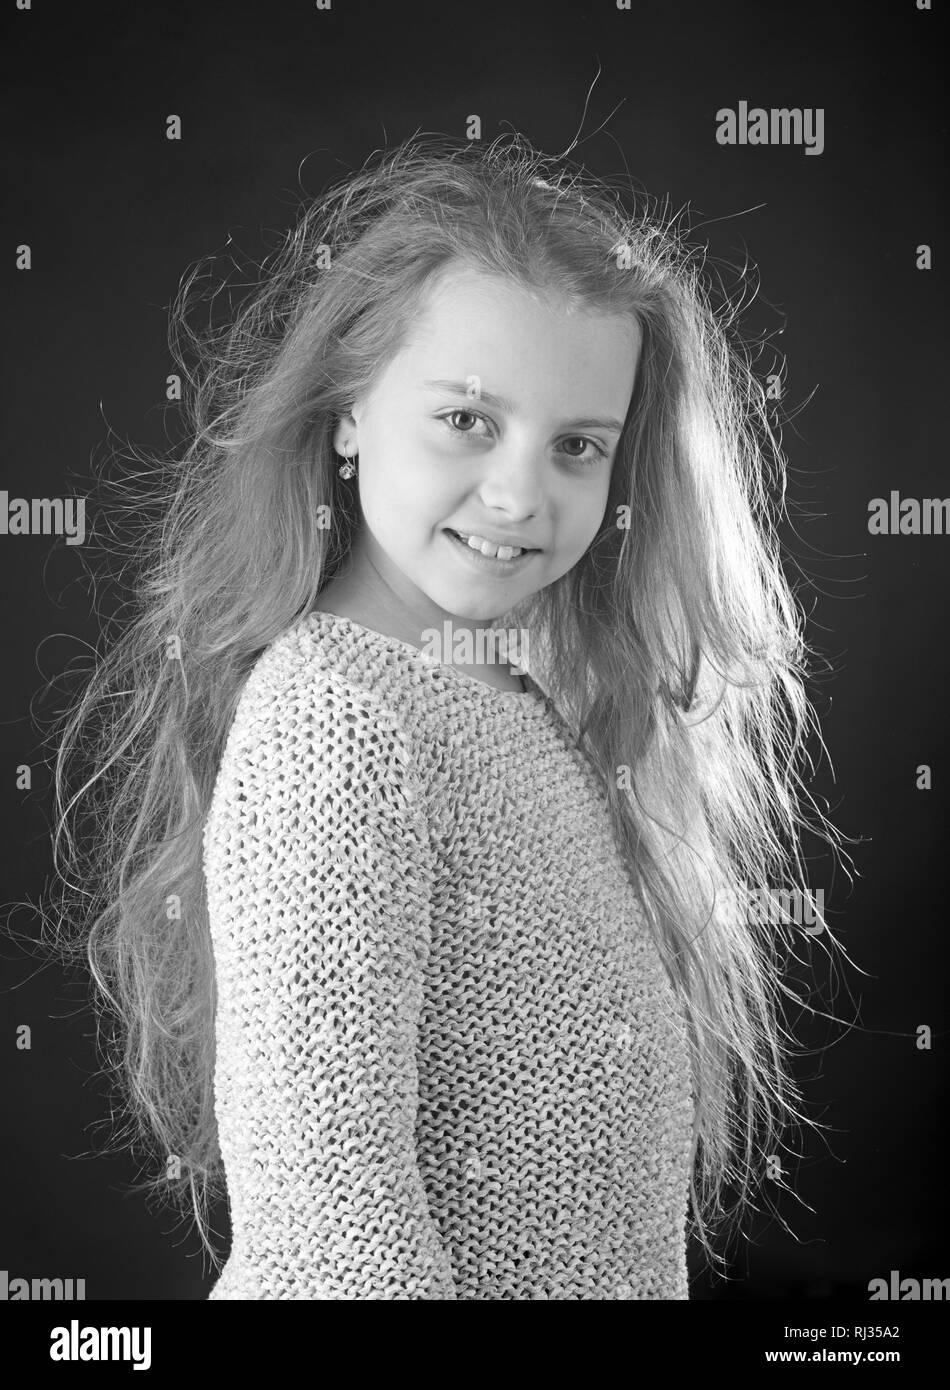 ls models preteen child little girl brainstudy.info